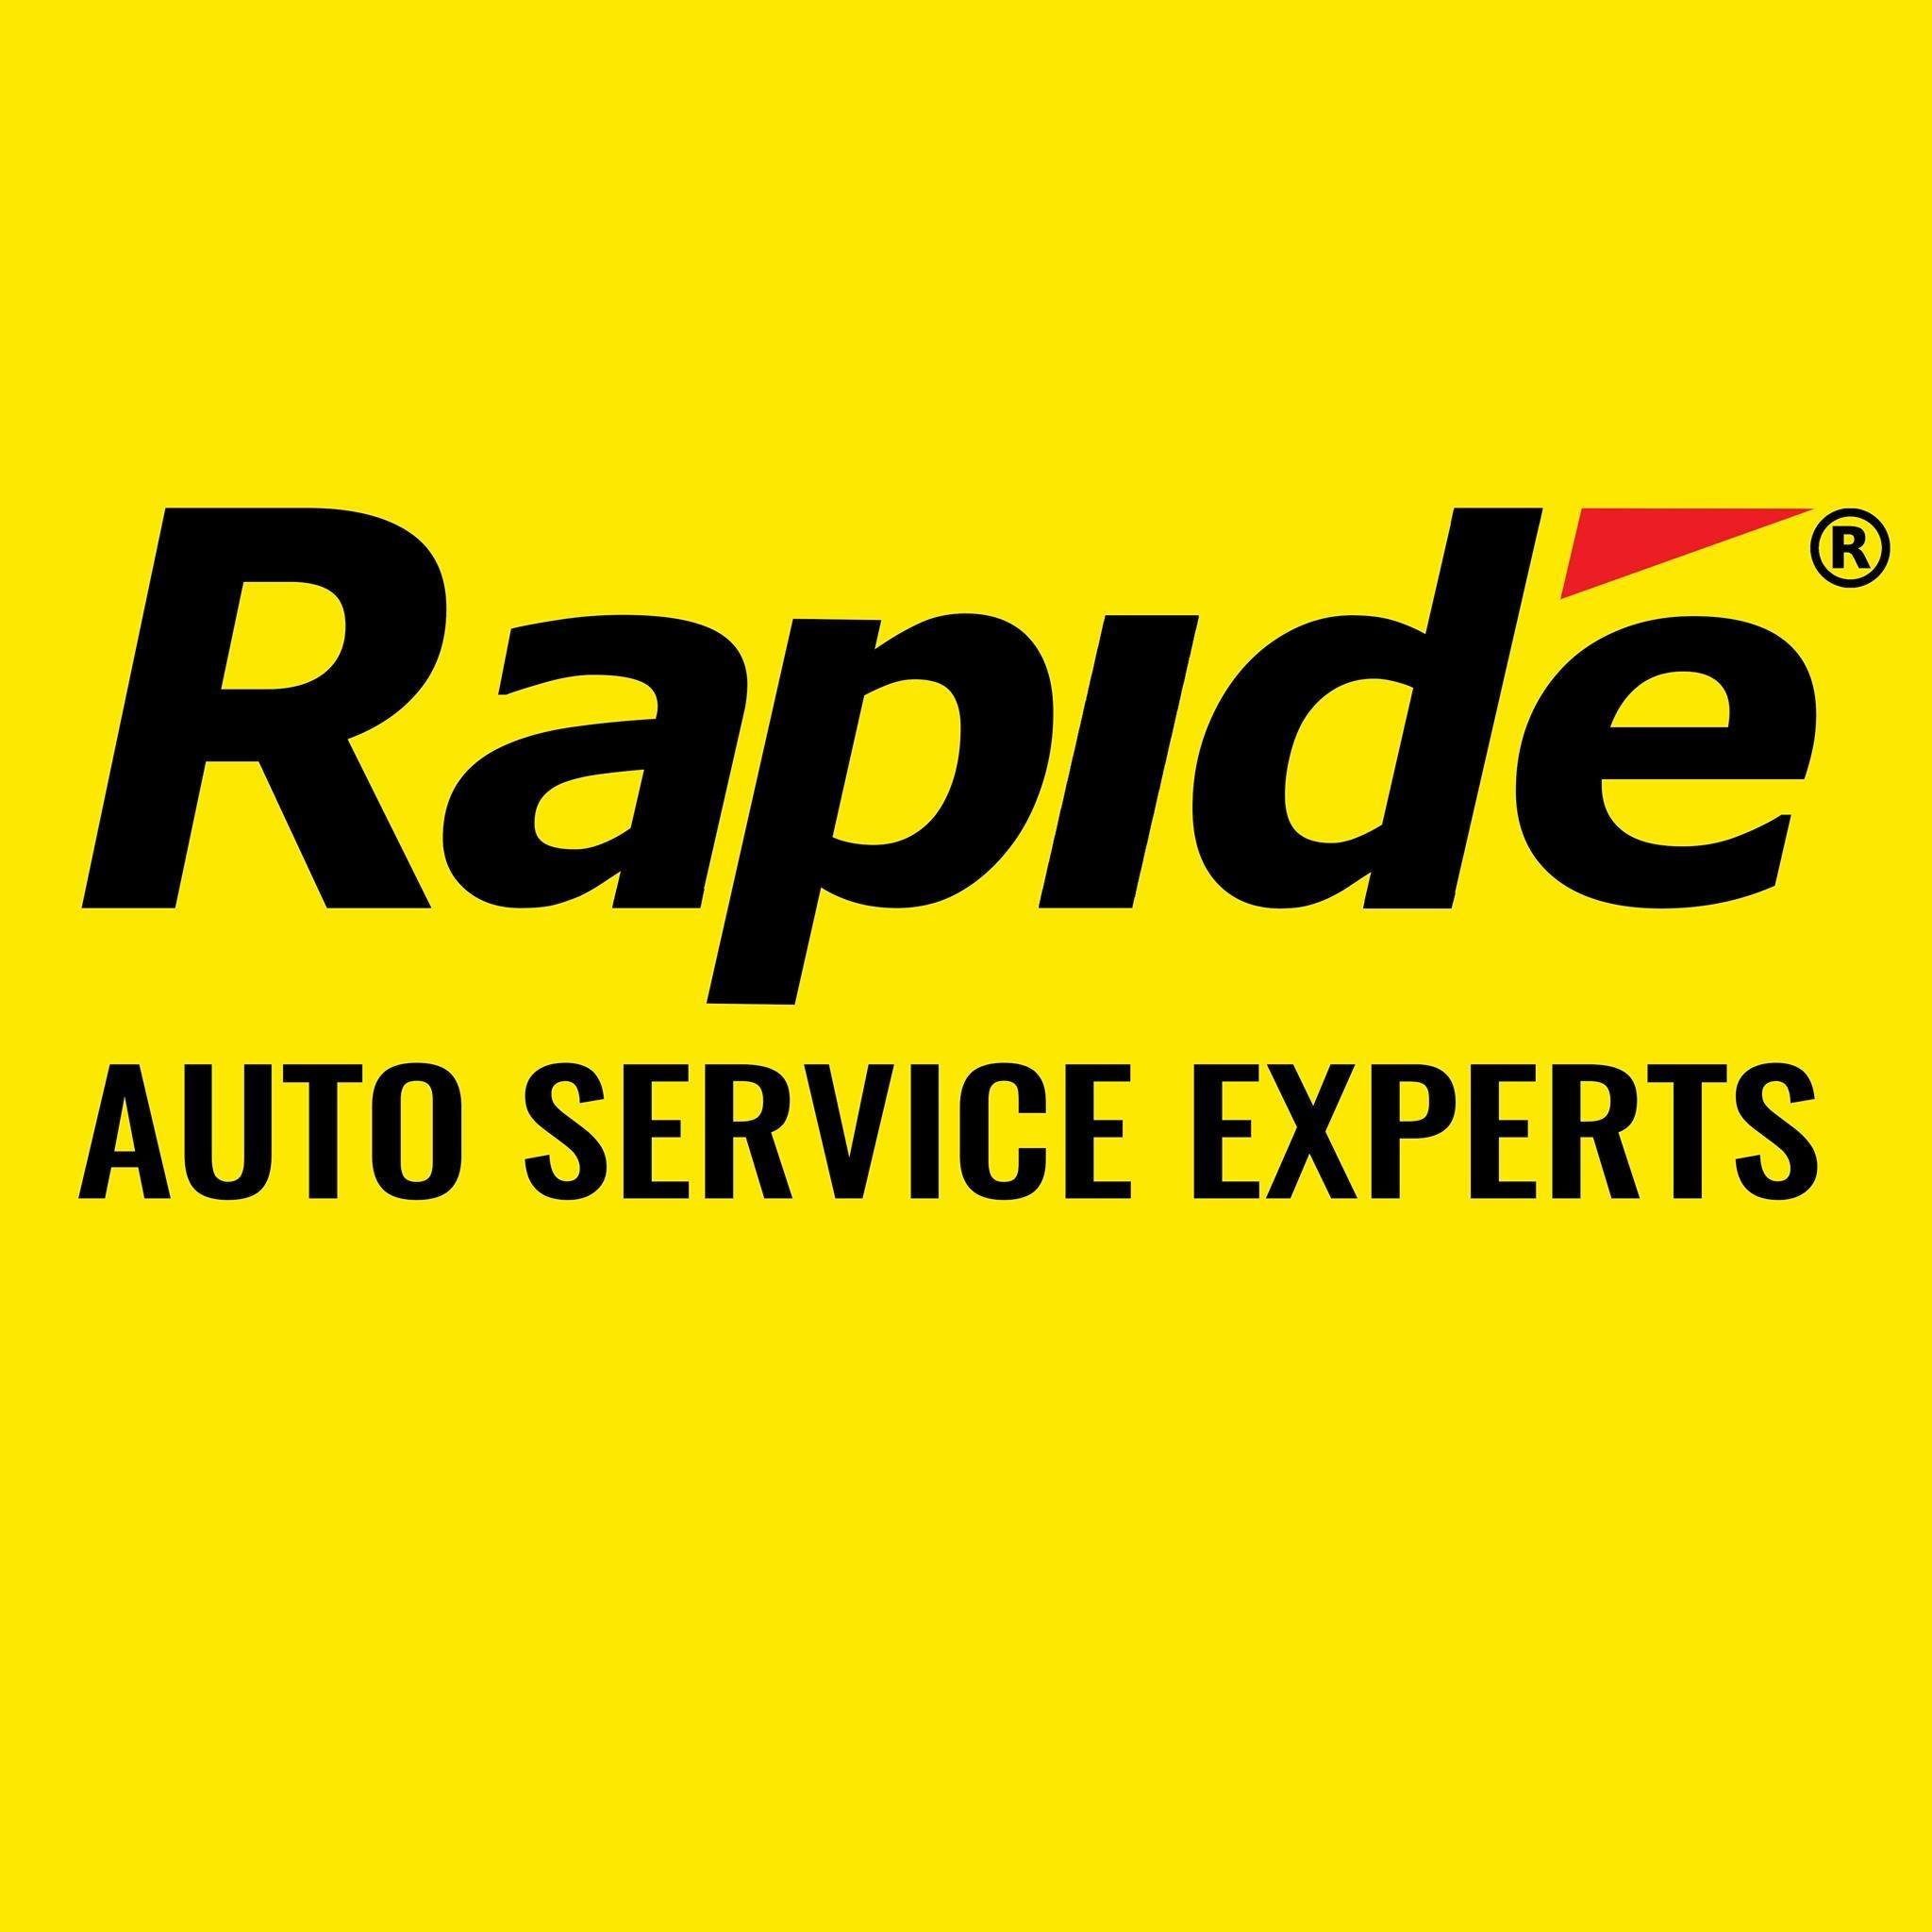 Rapide Auto Service - Car Repair San Carlos Pangasinan